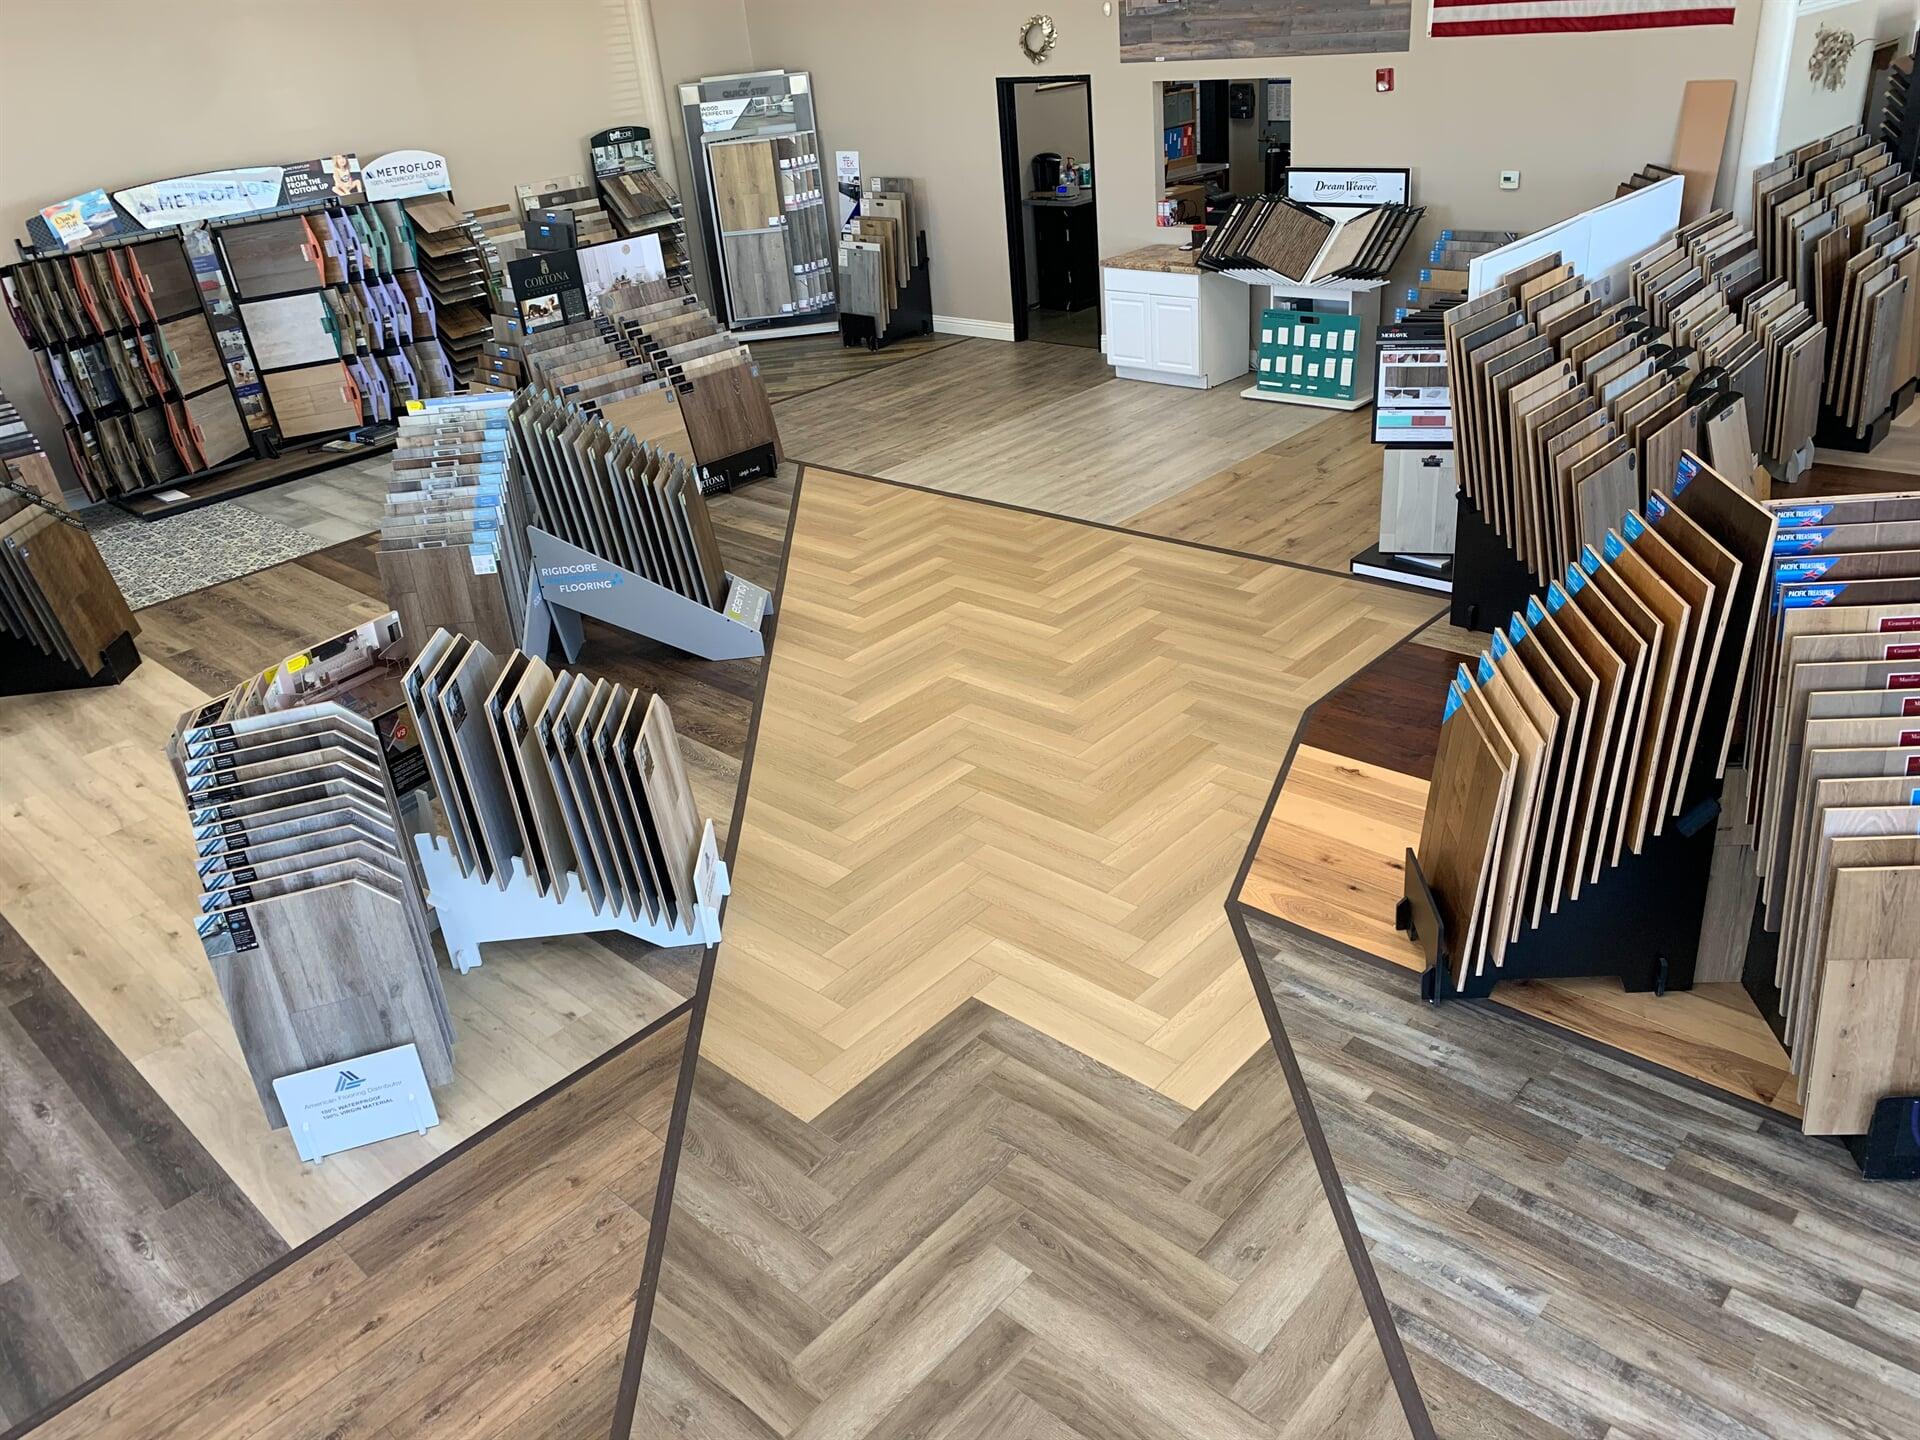 Hardwood Floors Outlet showroom near Temecula, CA